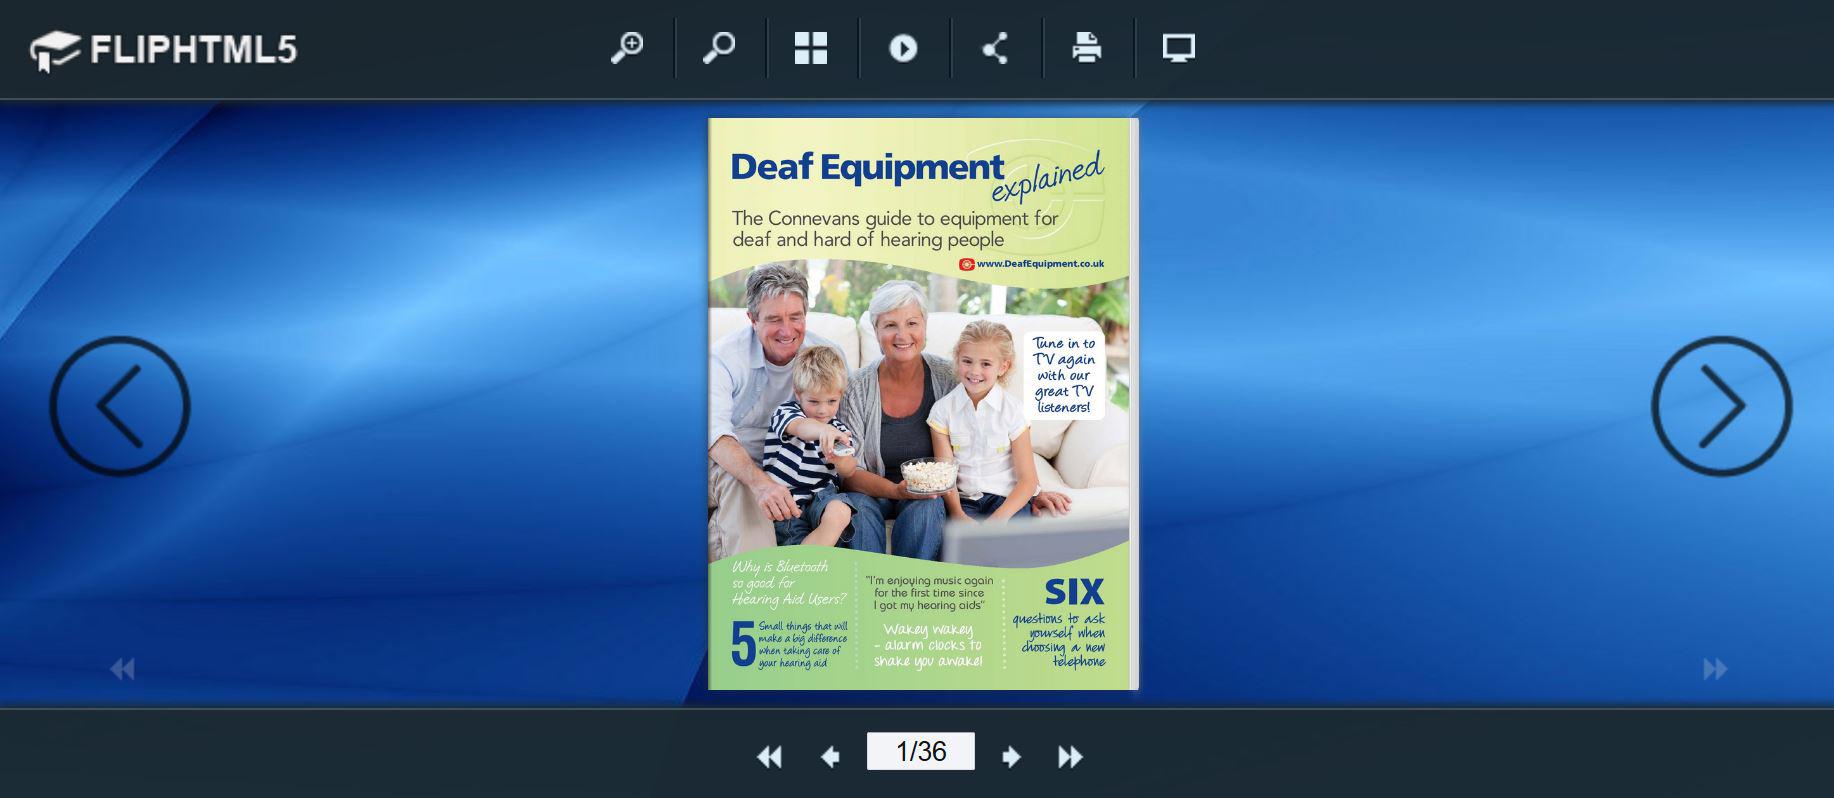 deaf_equipment_explained_flip_image